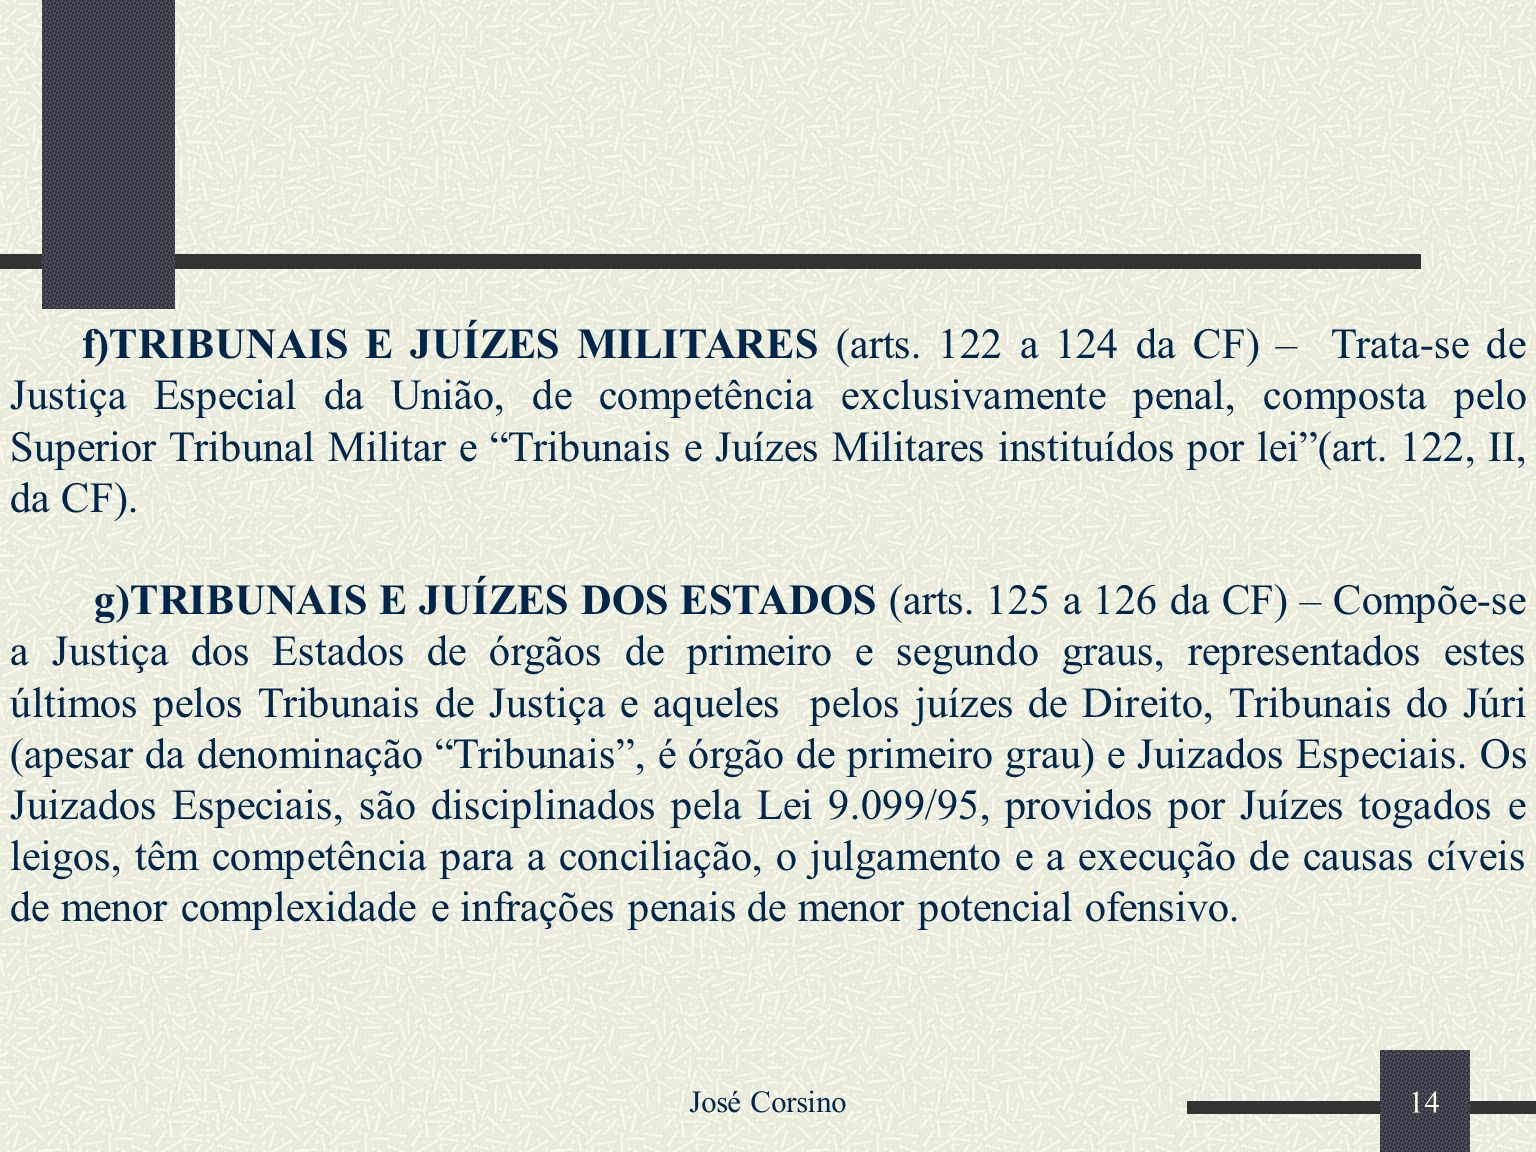 f)TRIBUNAIS E JUÍZES MILITARES (arts